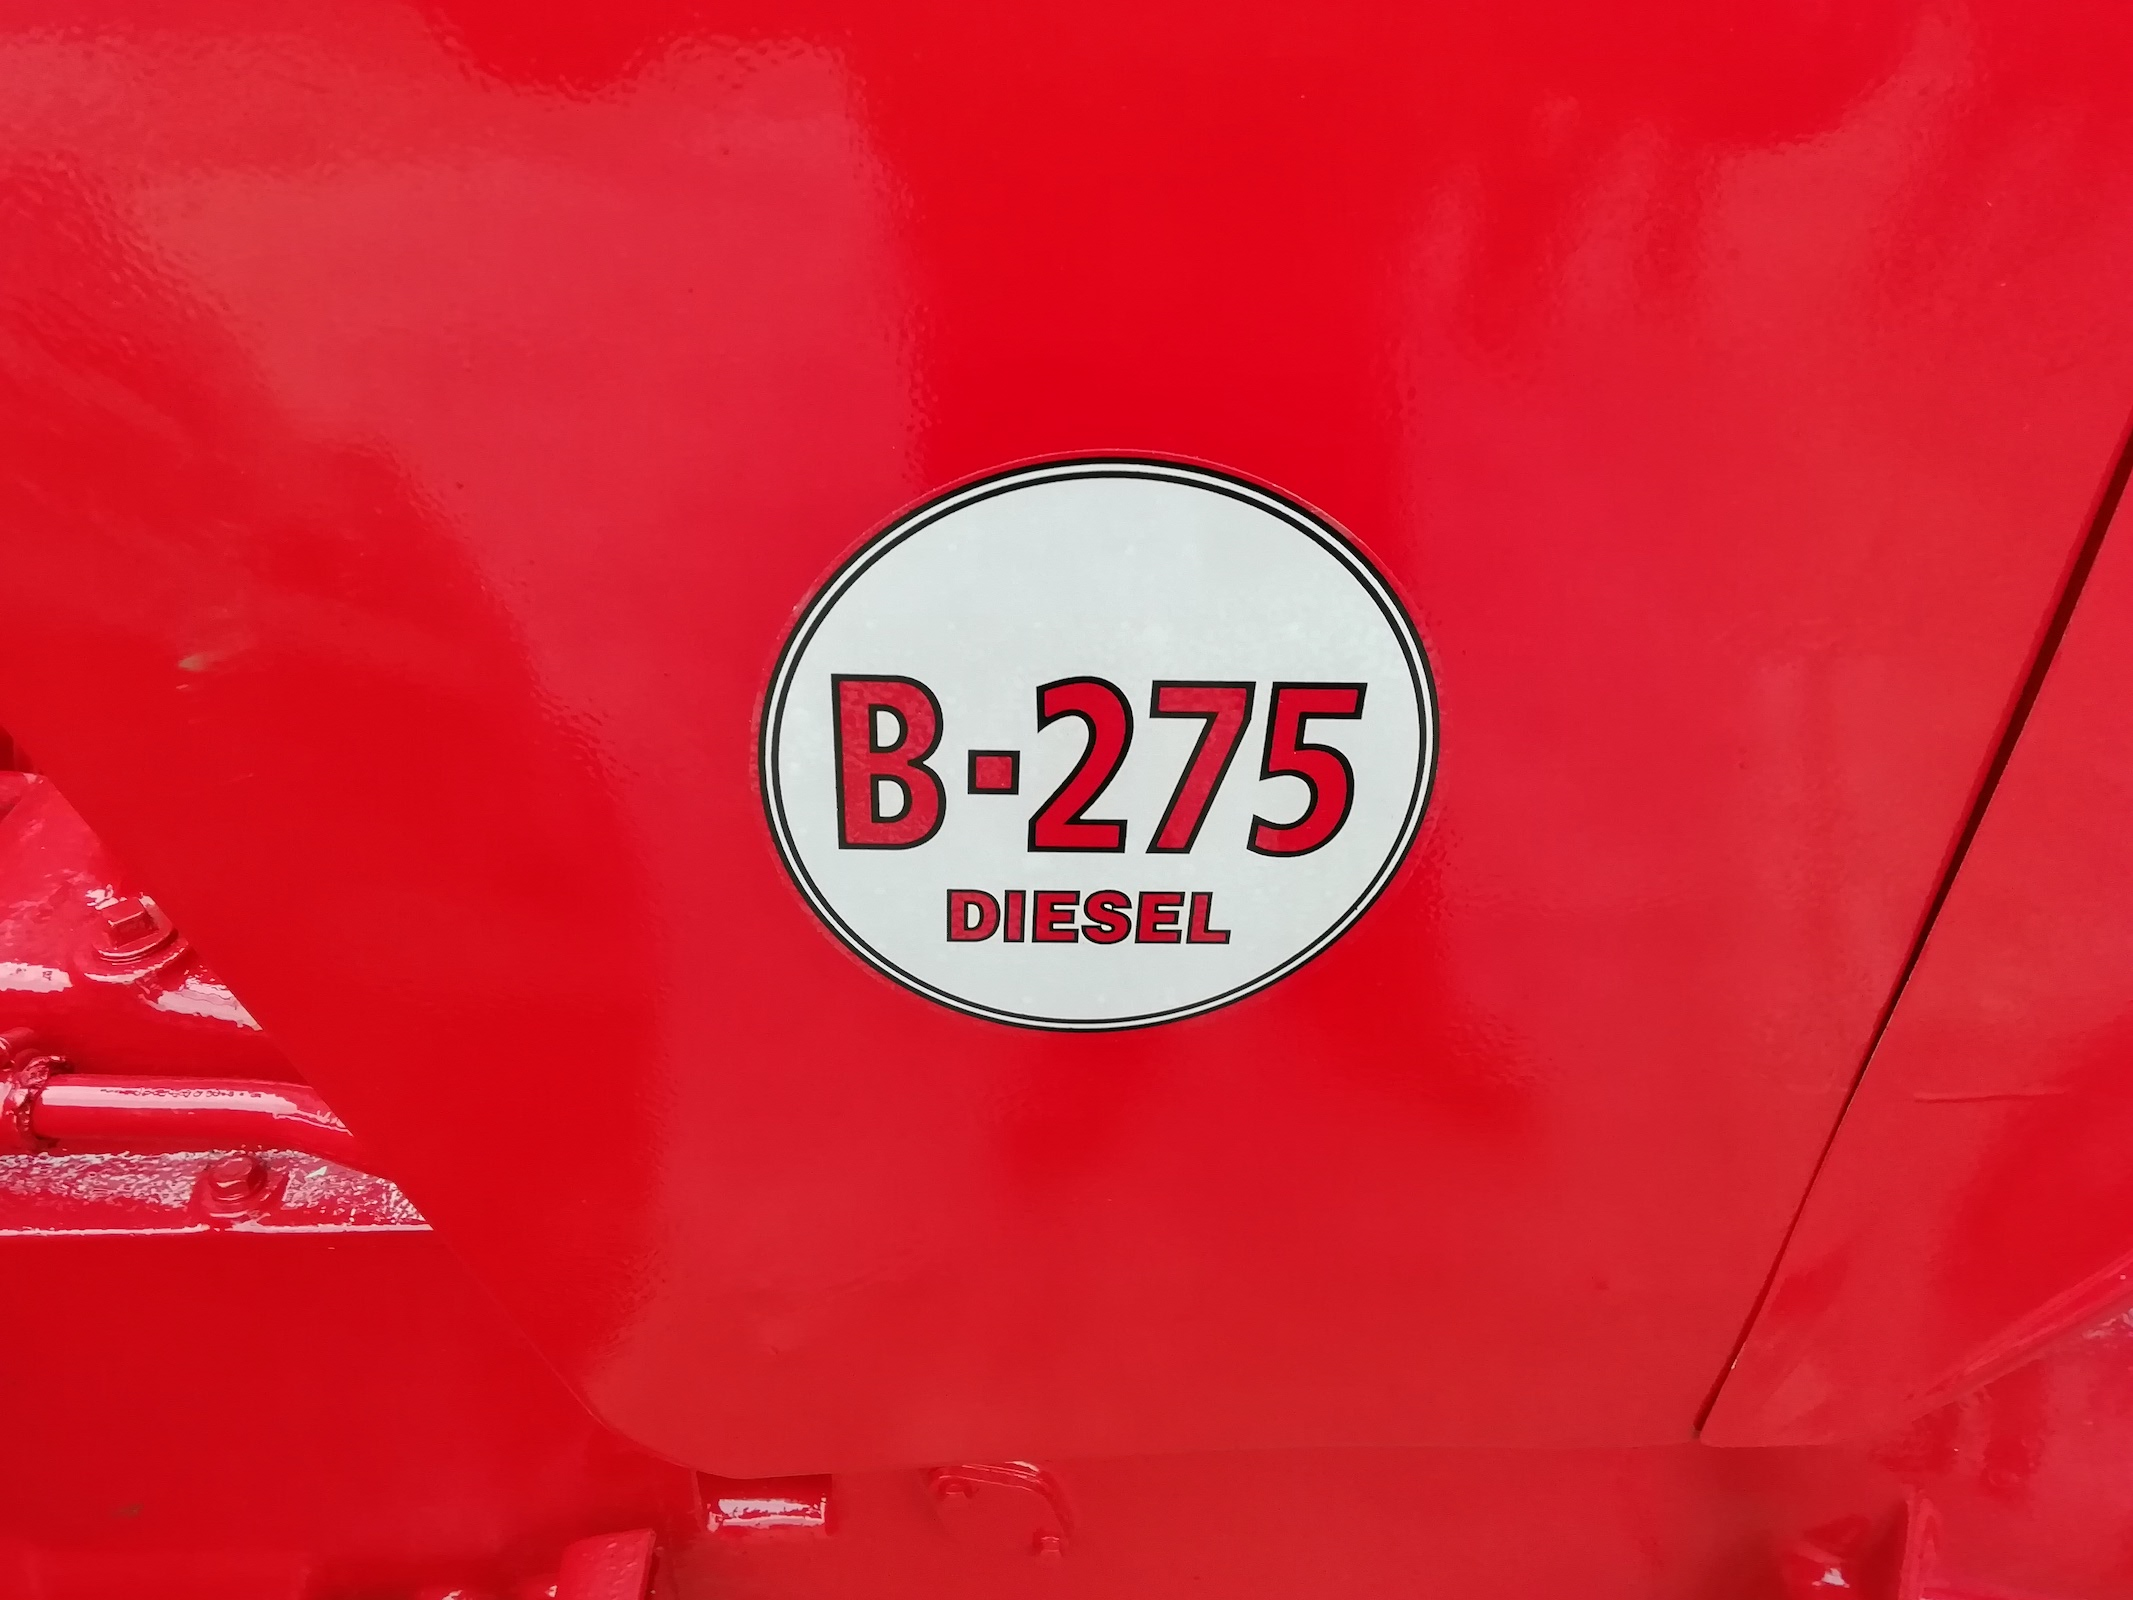 B-275